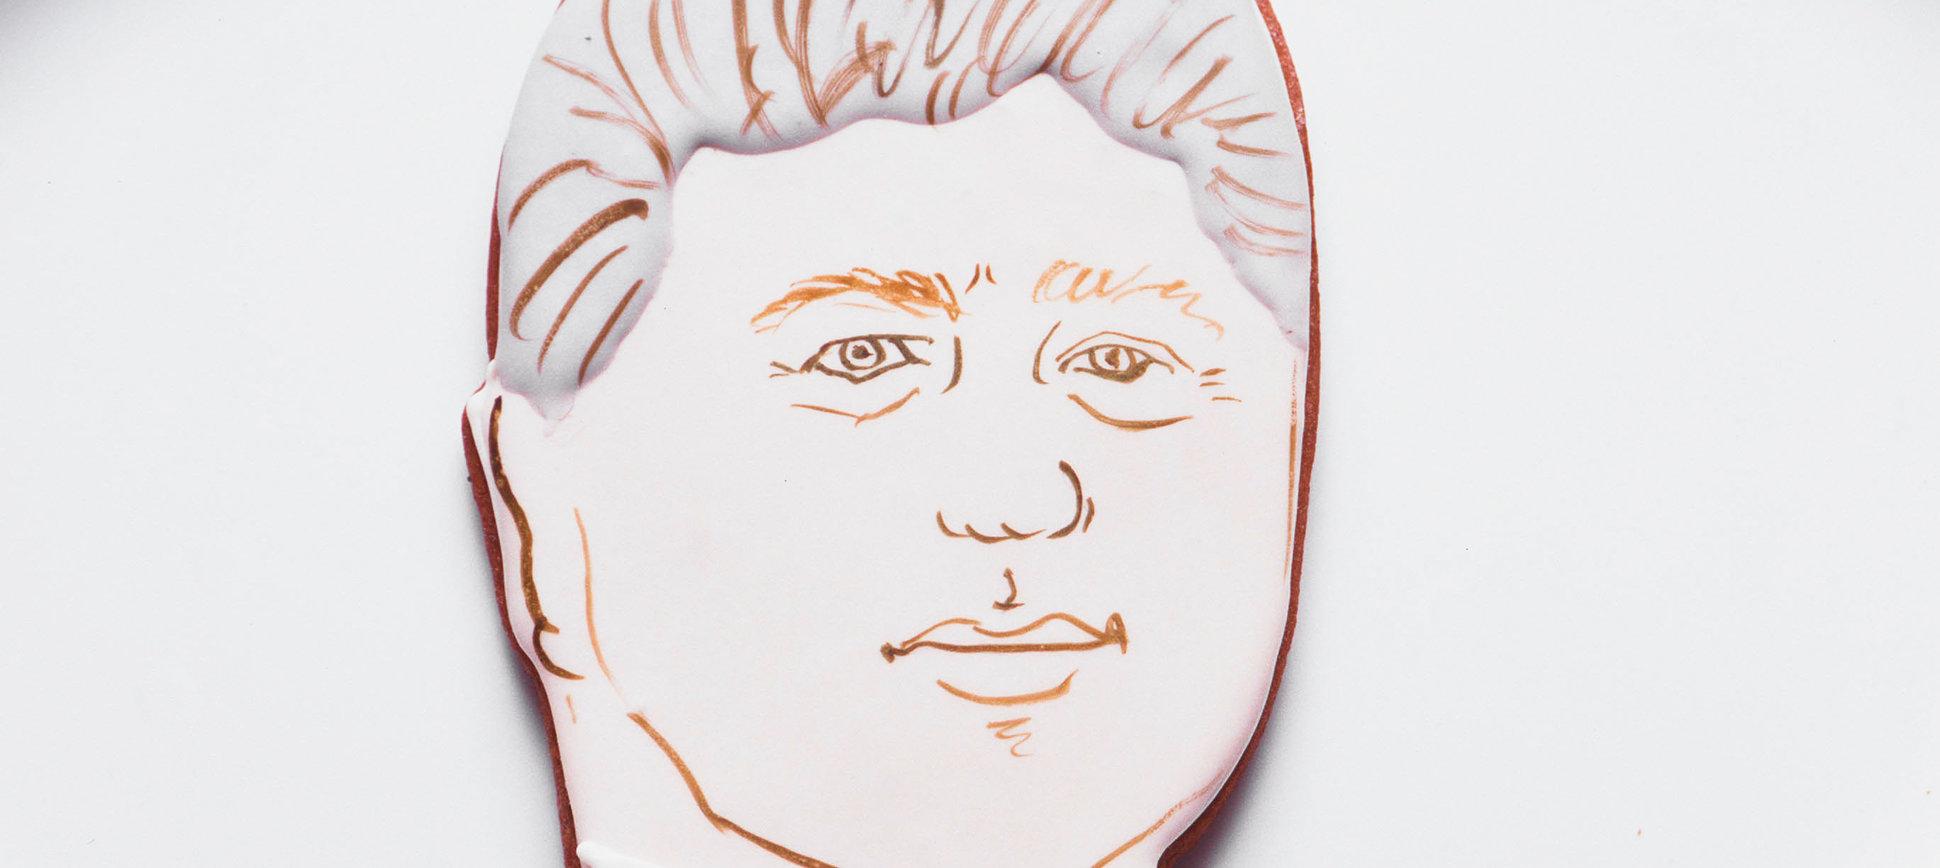 Bill Clinton Bakes Cookies, Makes History